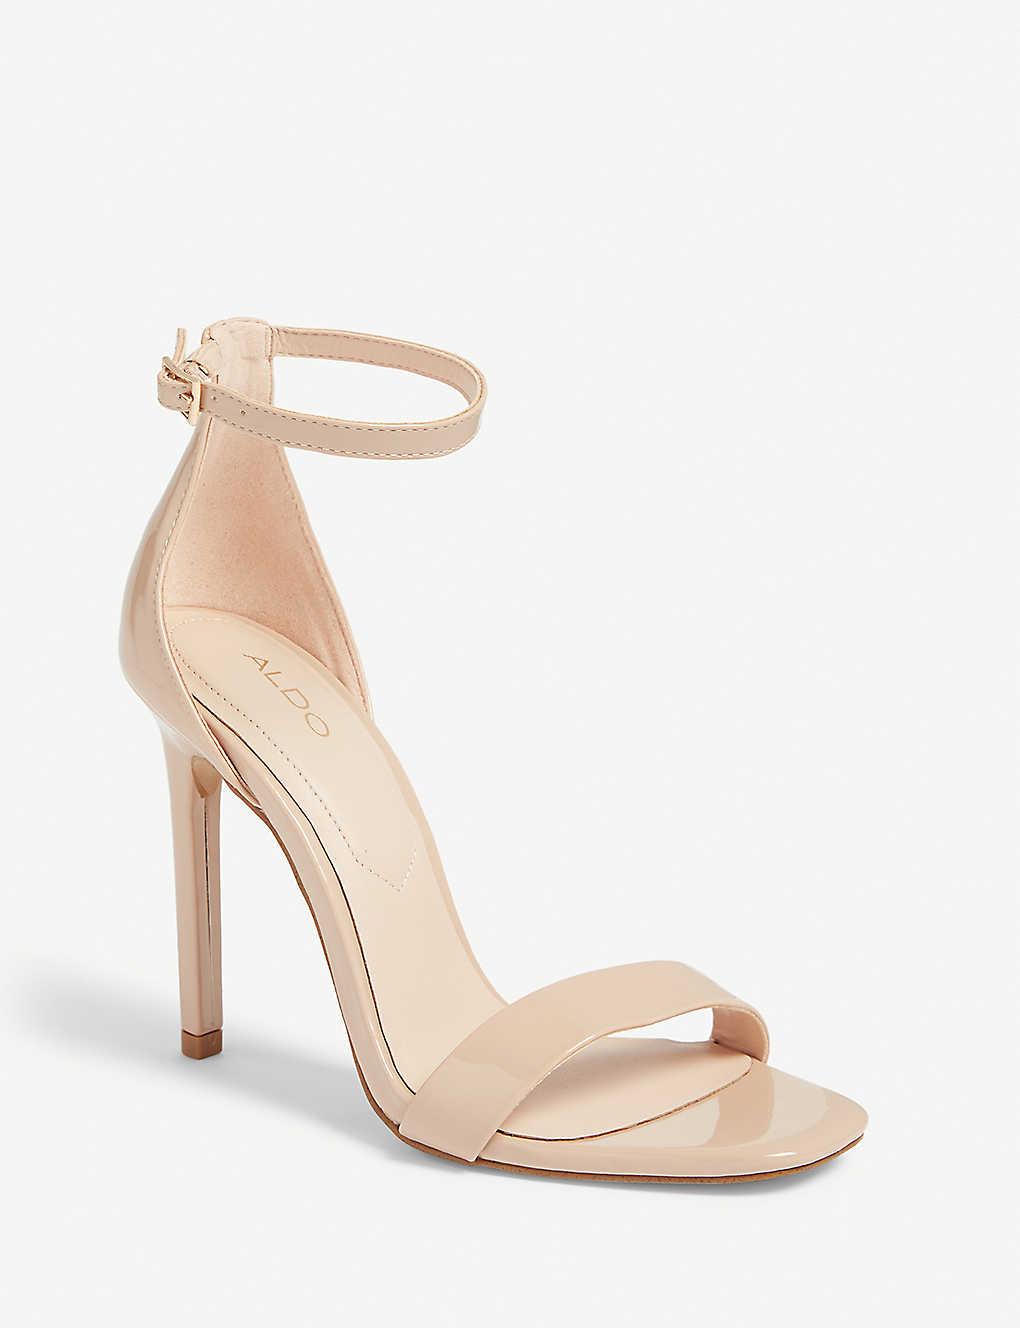 29c3d589b27a ... Derolila high ankle strap sandals - Bone ...